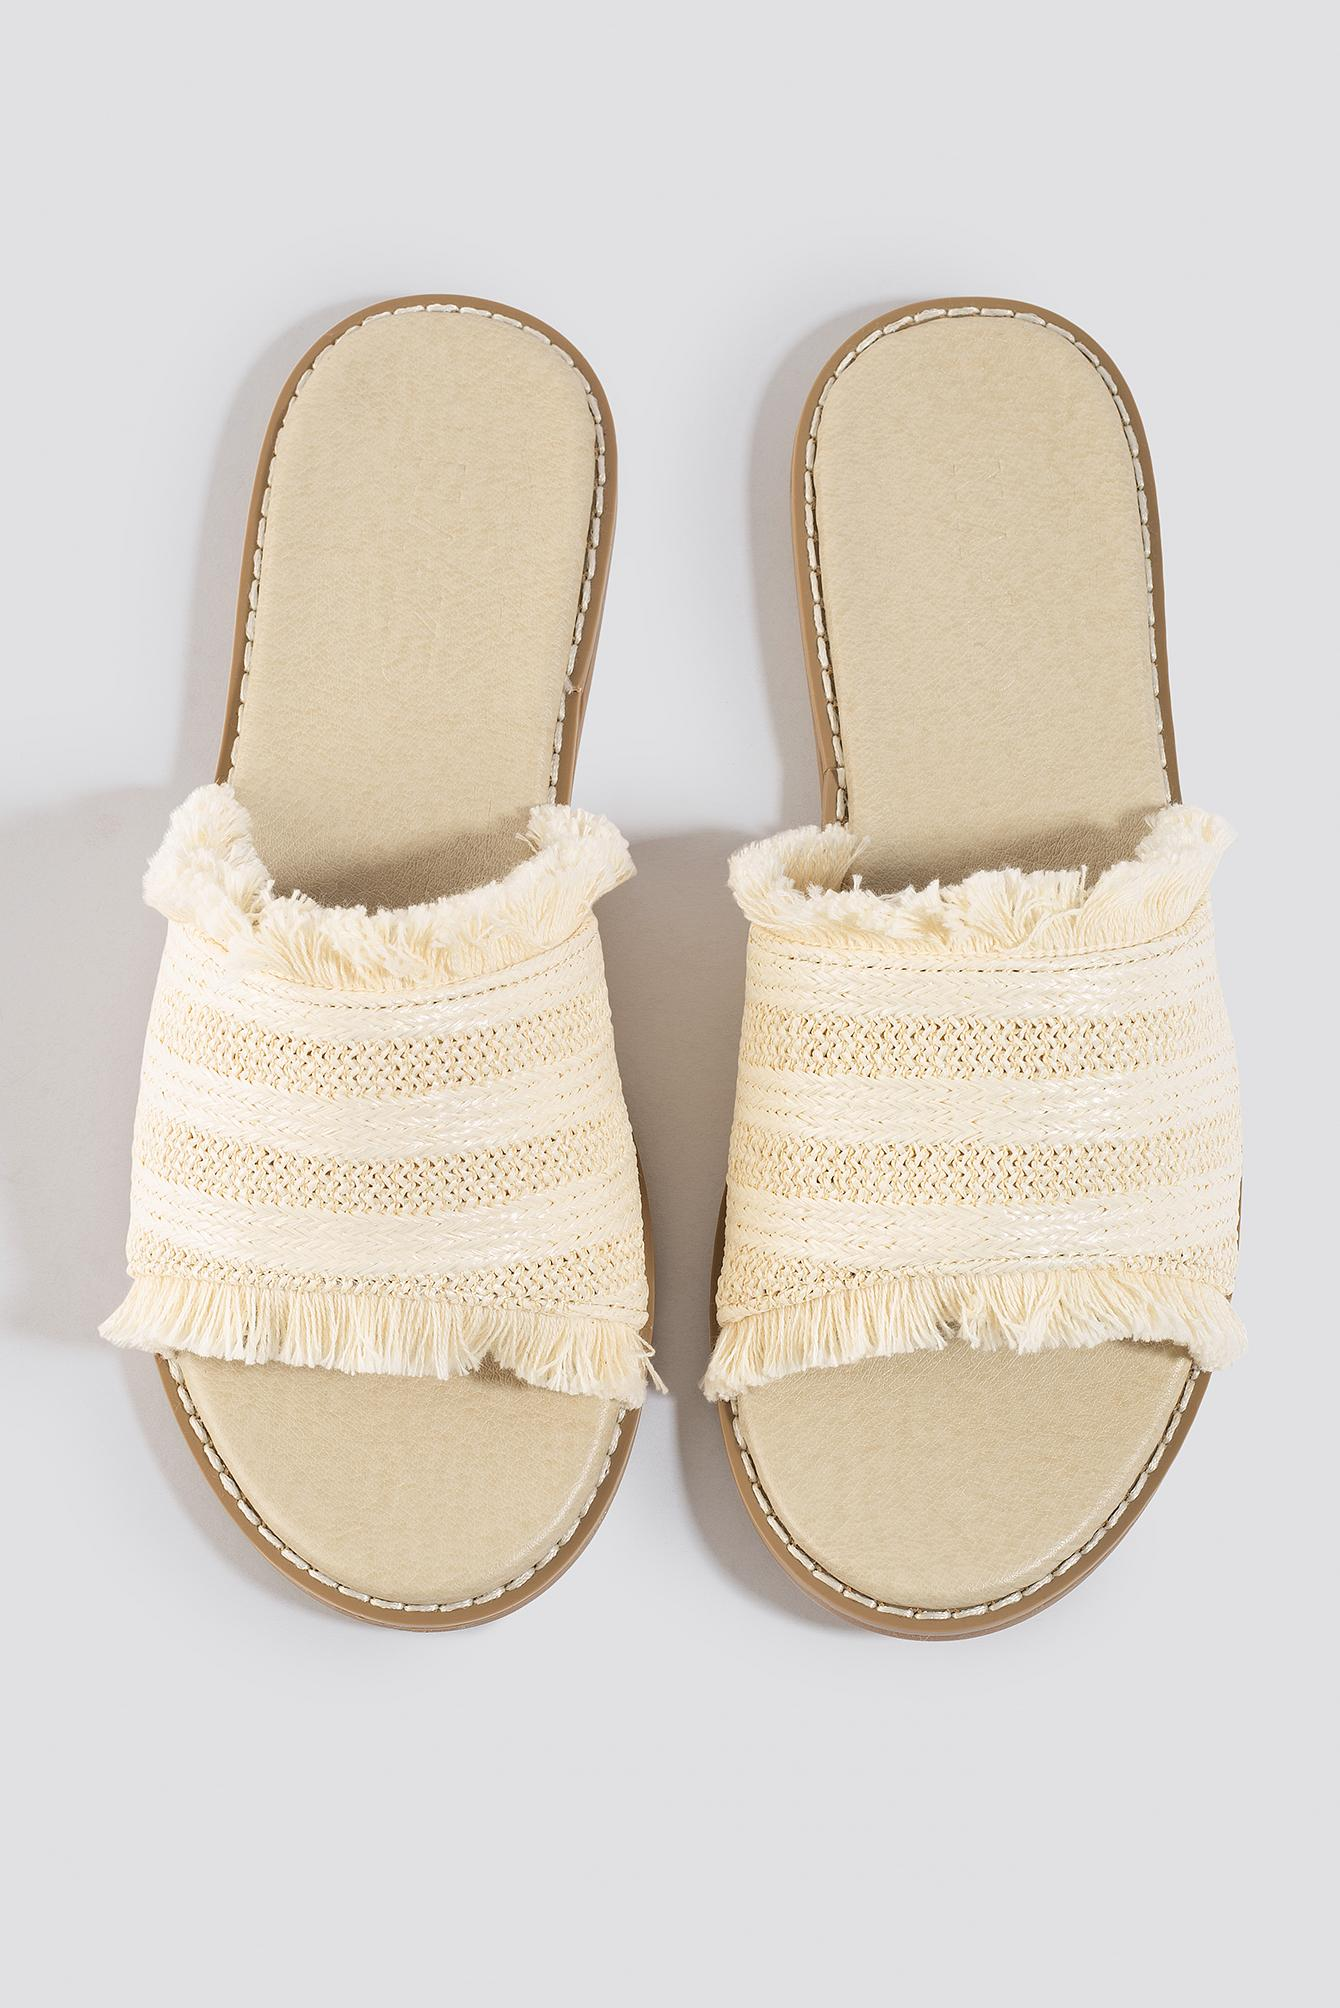 Strawy Sandals NA-KD en coloris Neutre